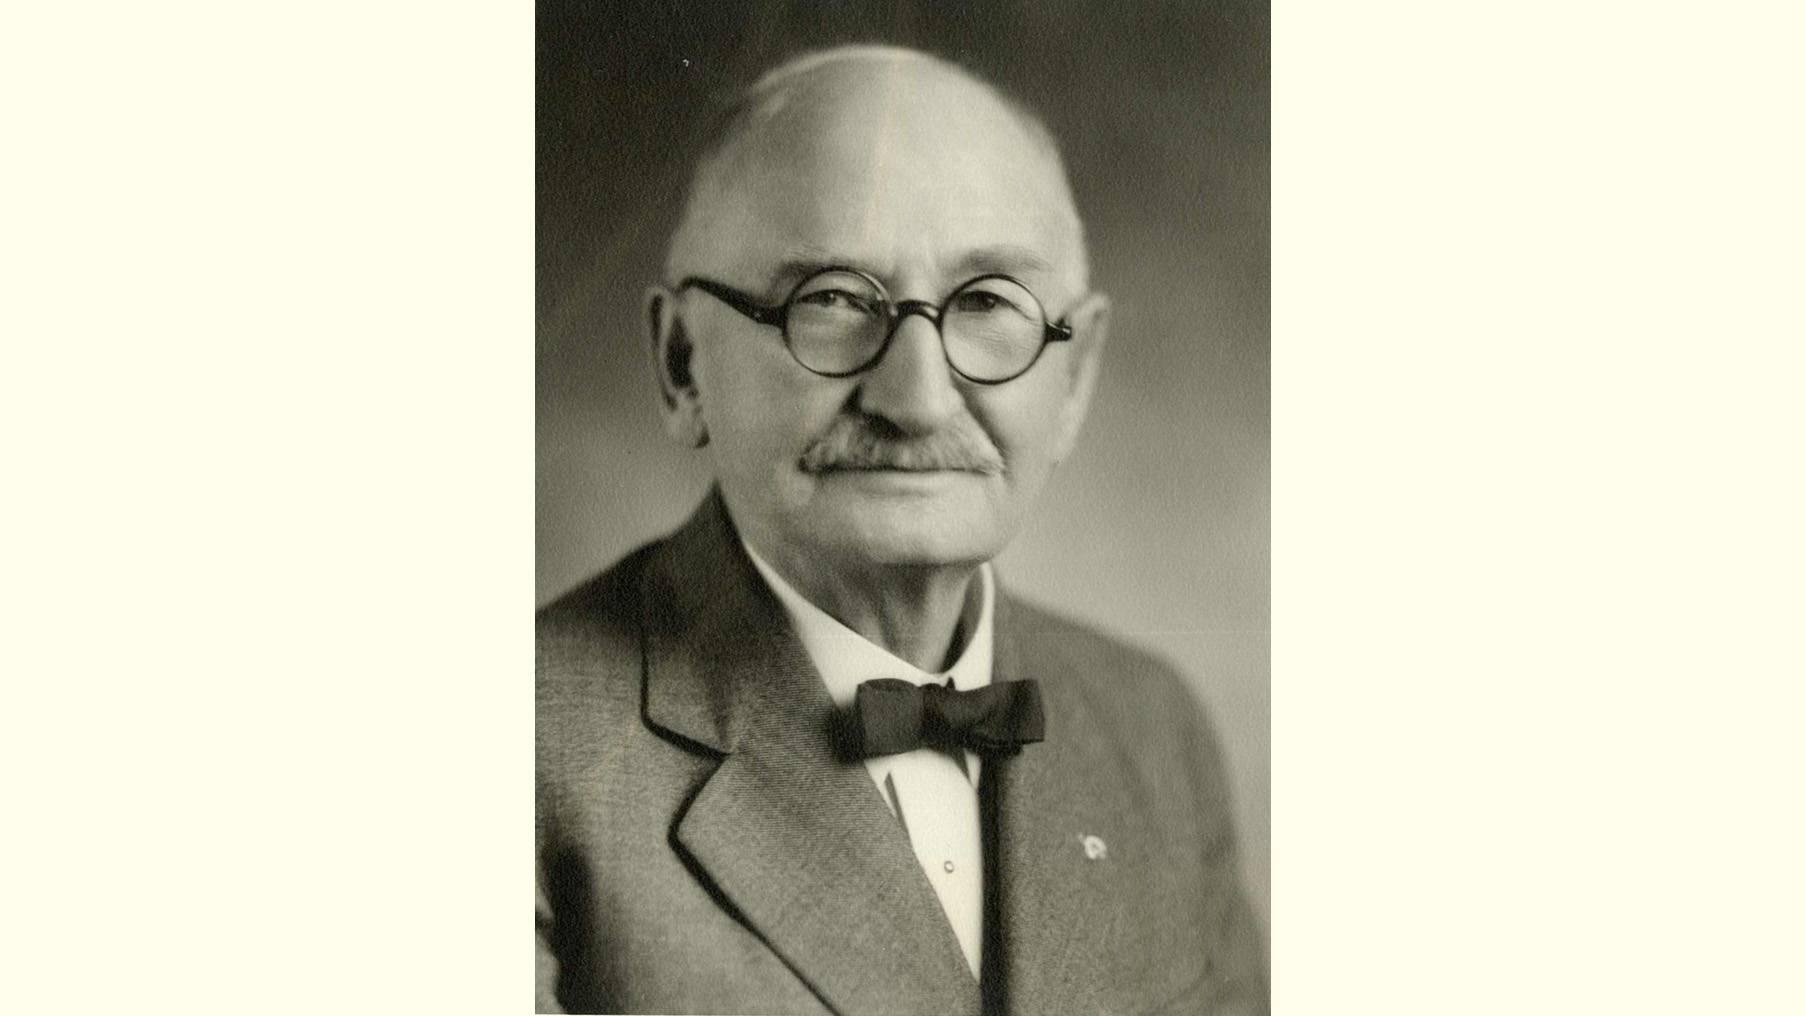 George V. Ayres